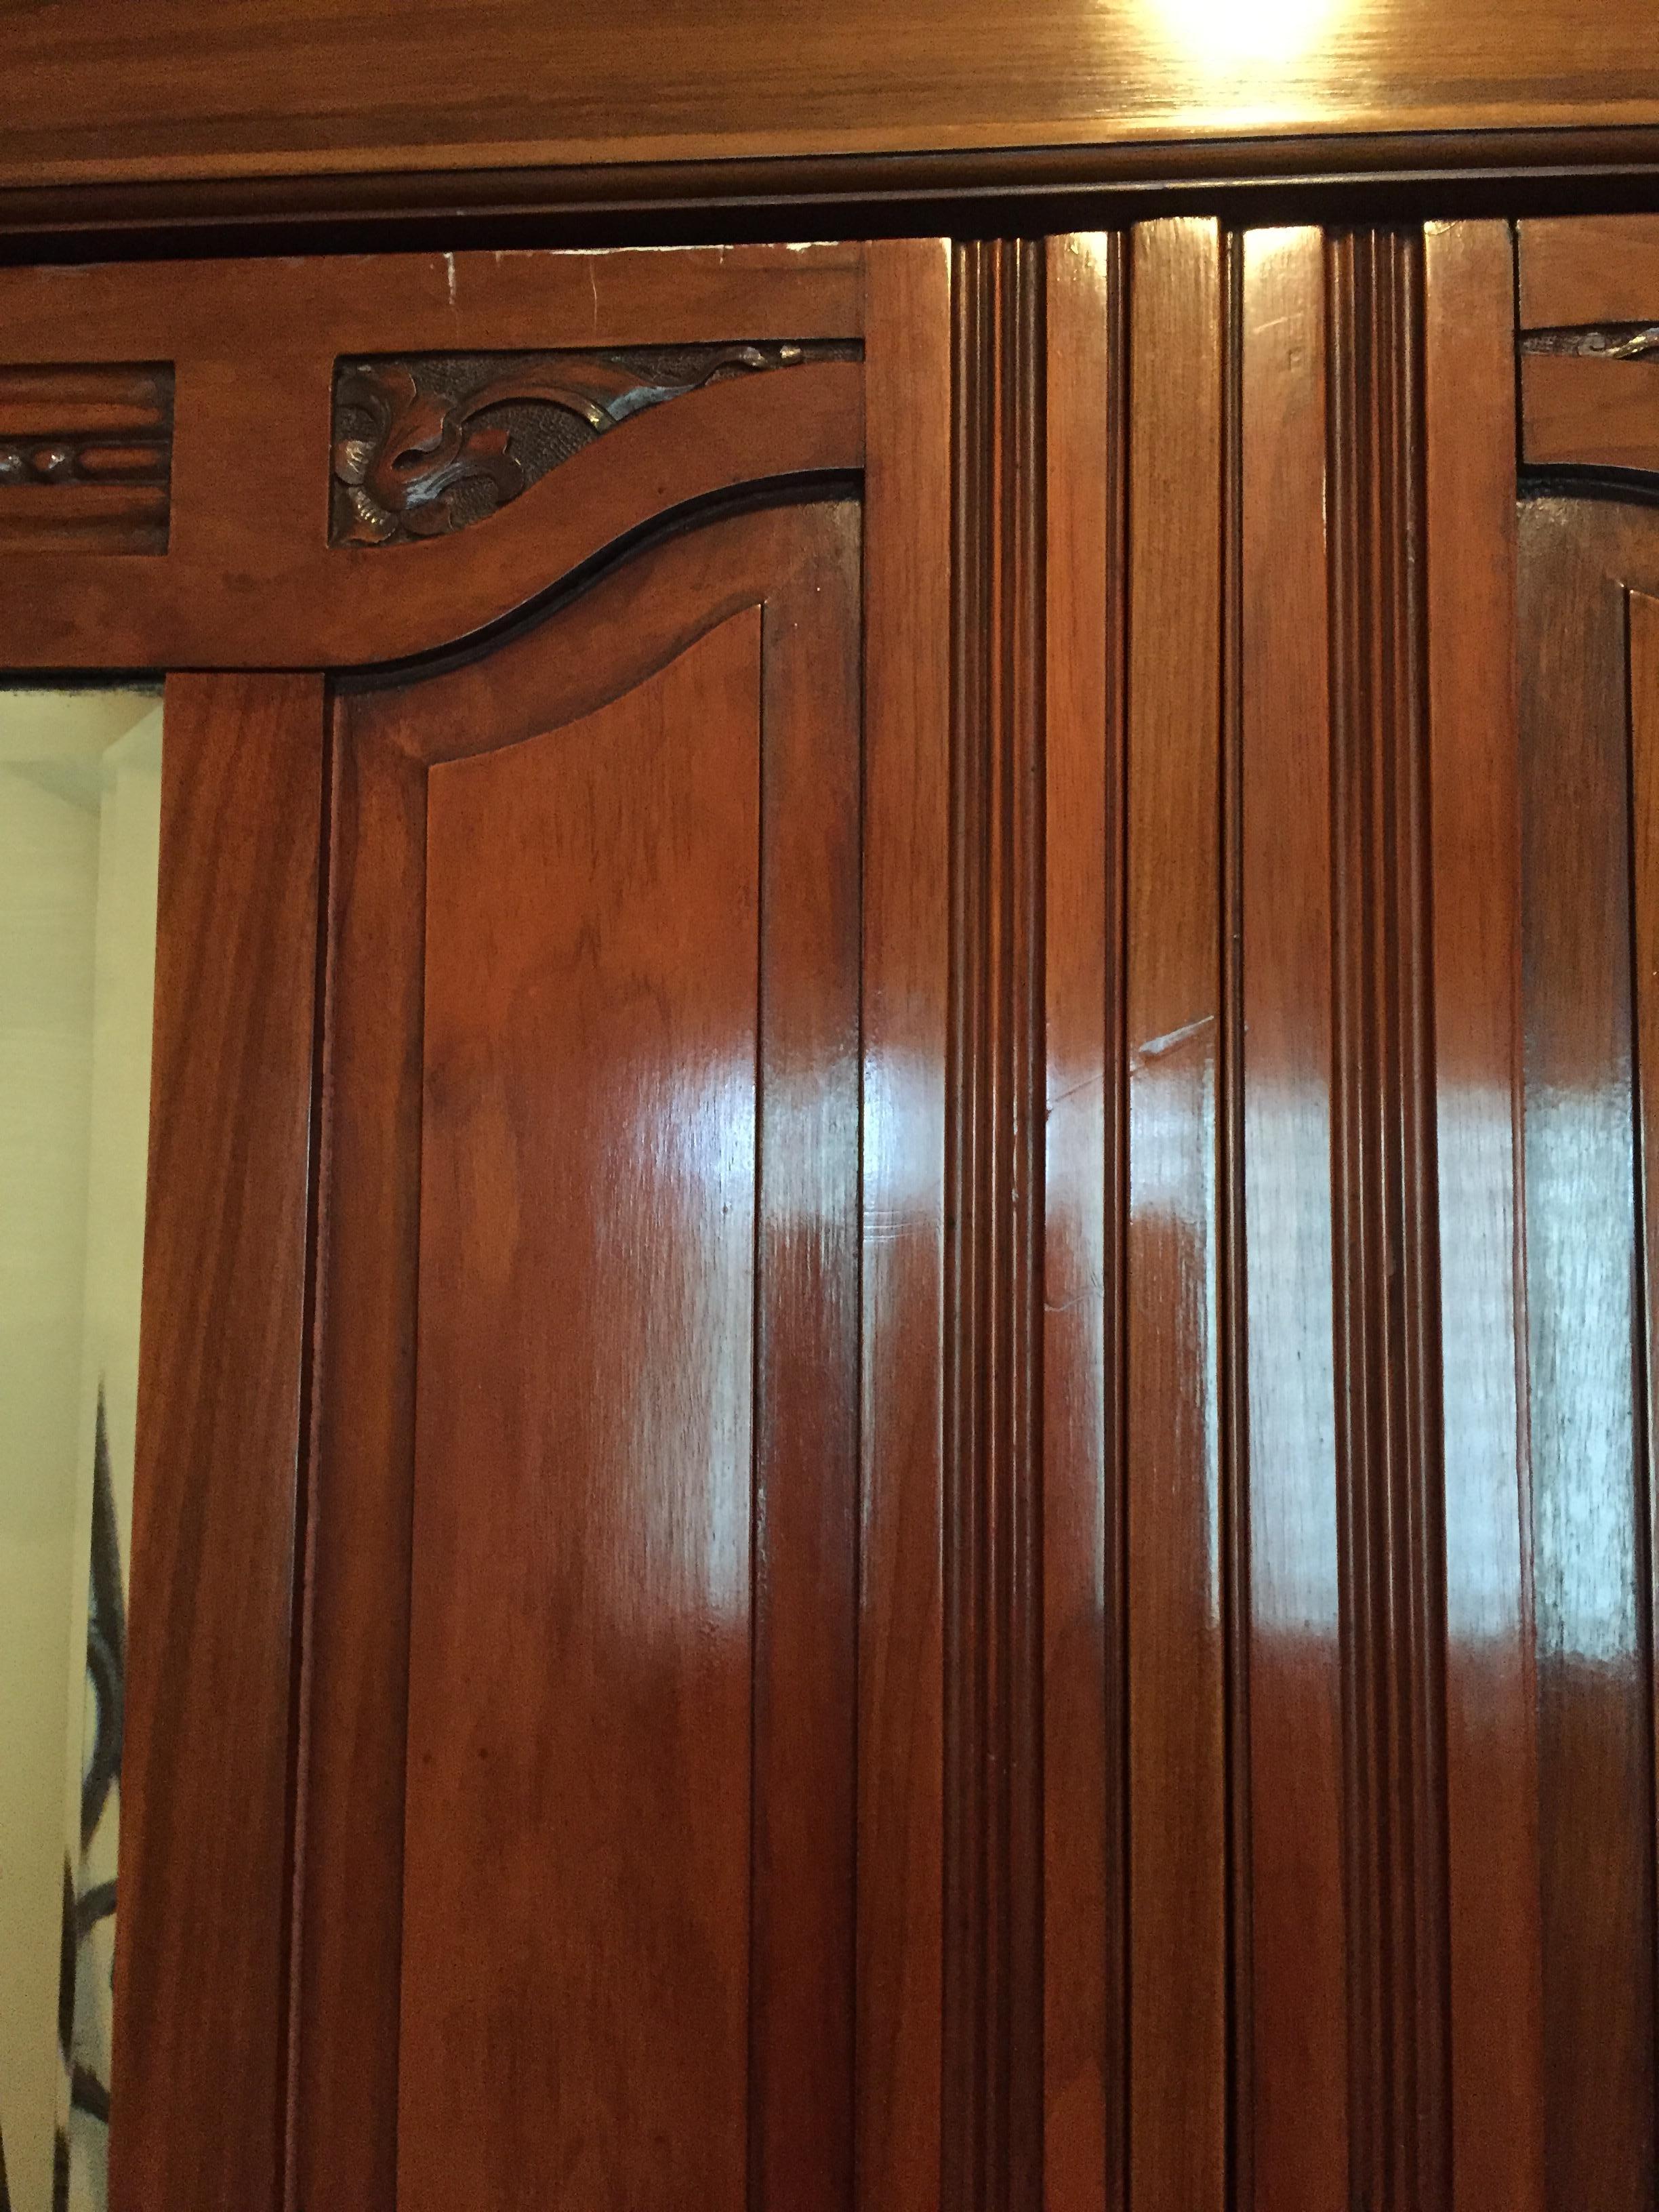 Cws pelaw antique armoires Appraisal Cws Pelaw On Tyne Antique Armoire Instappraisal Cws Pelaw On Tyne Antique Armoire Antique Appraisal Instappraisal